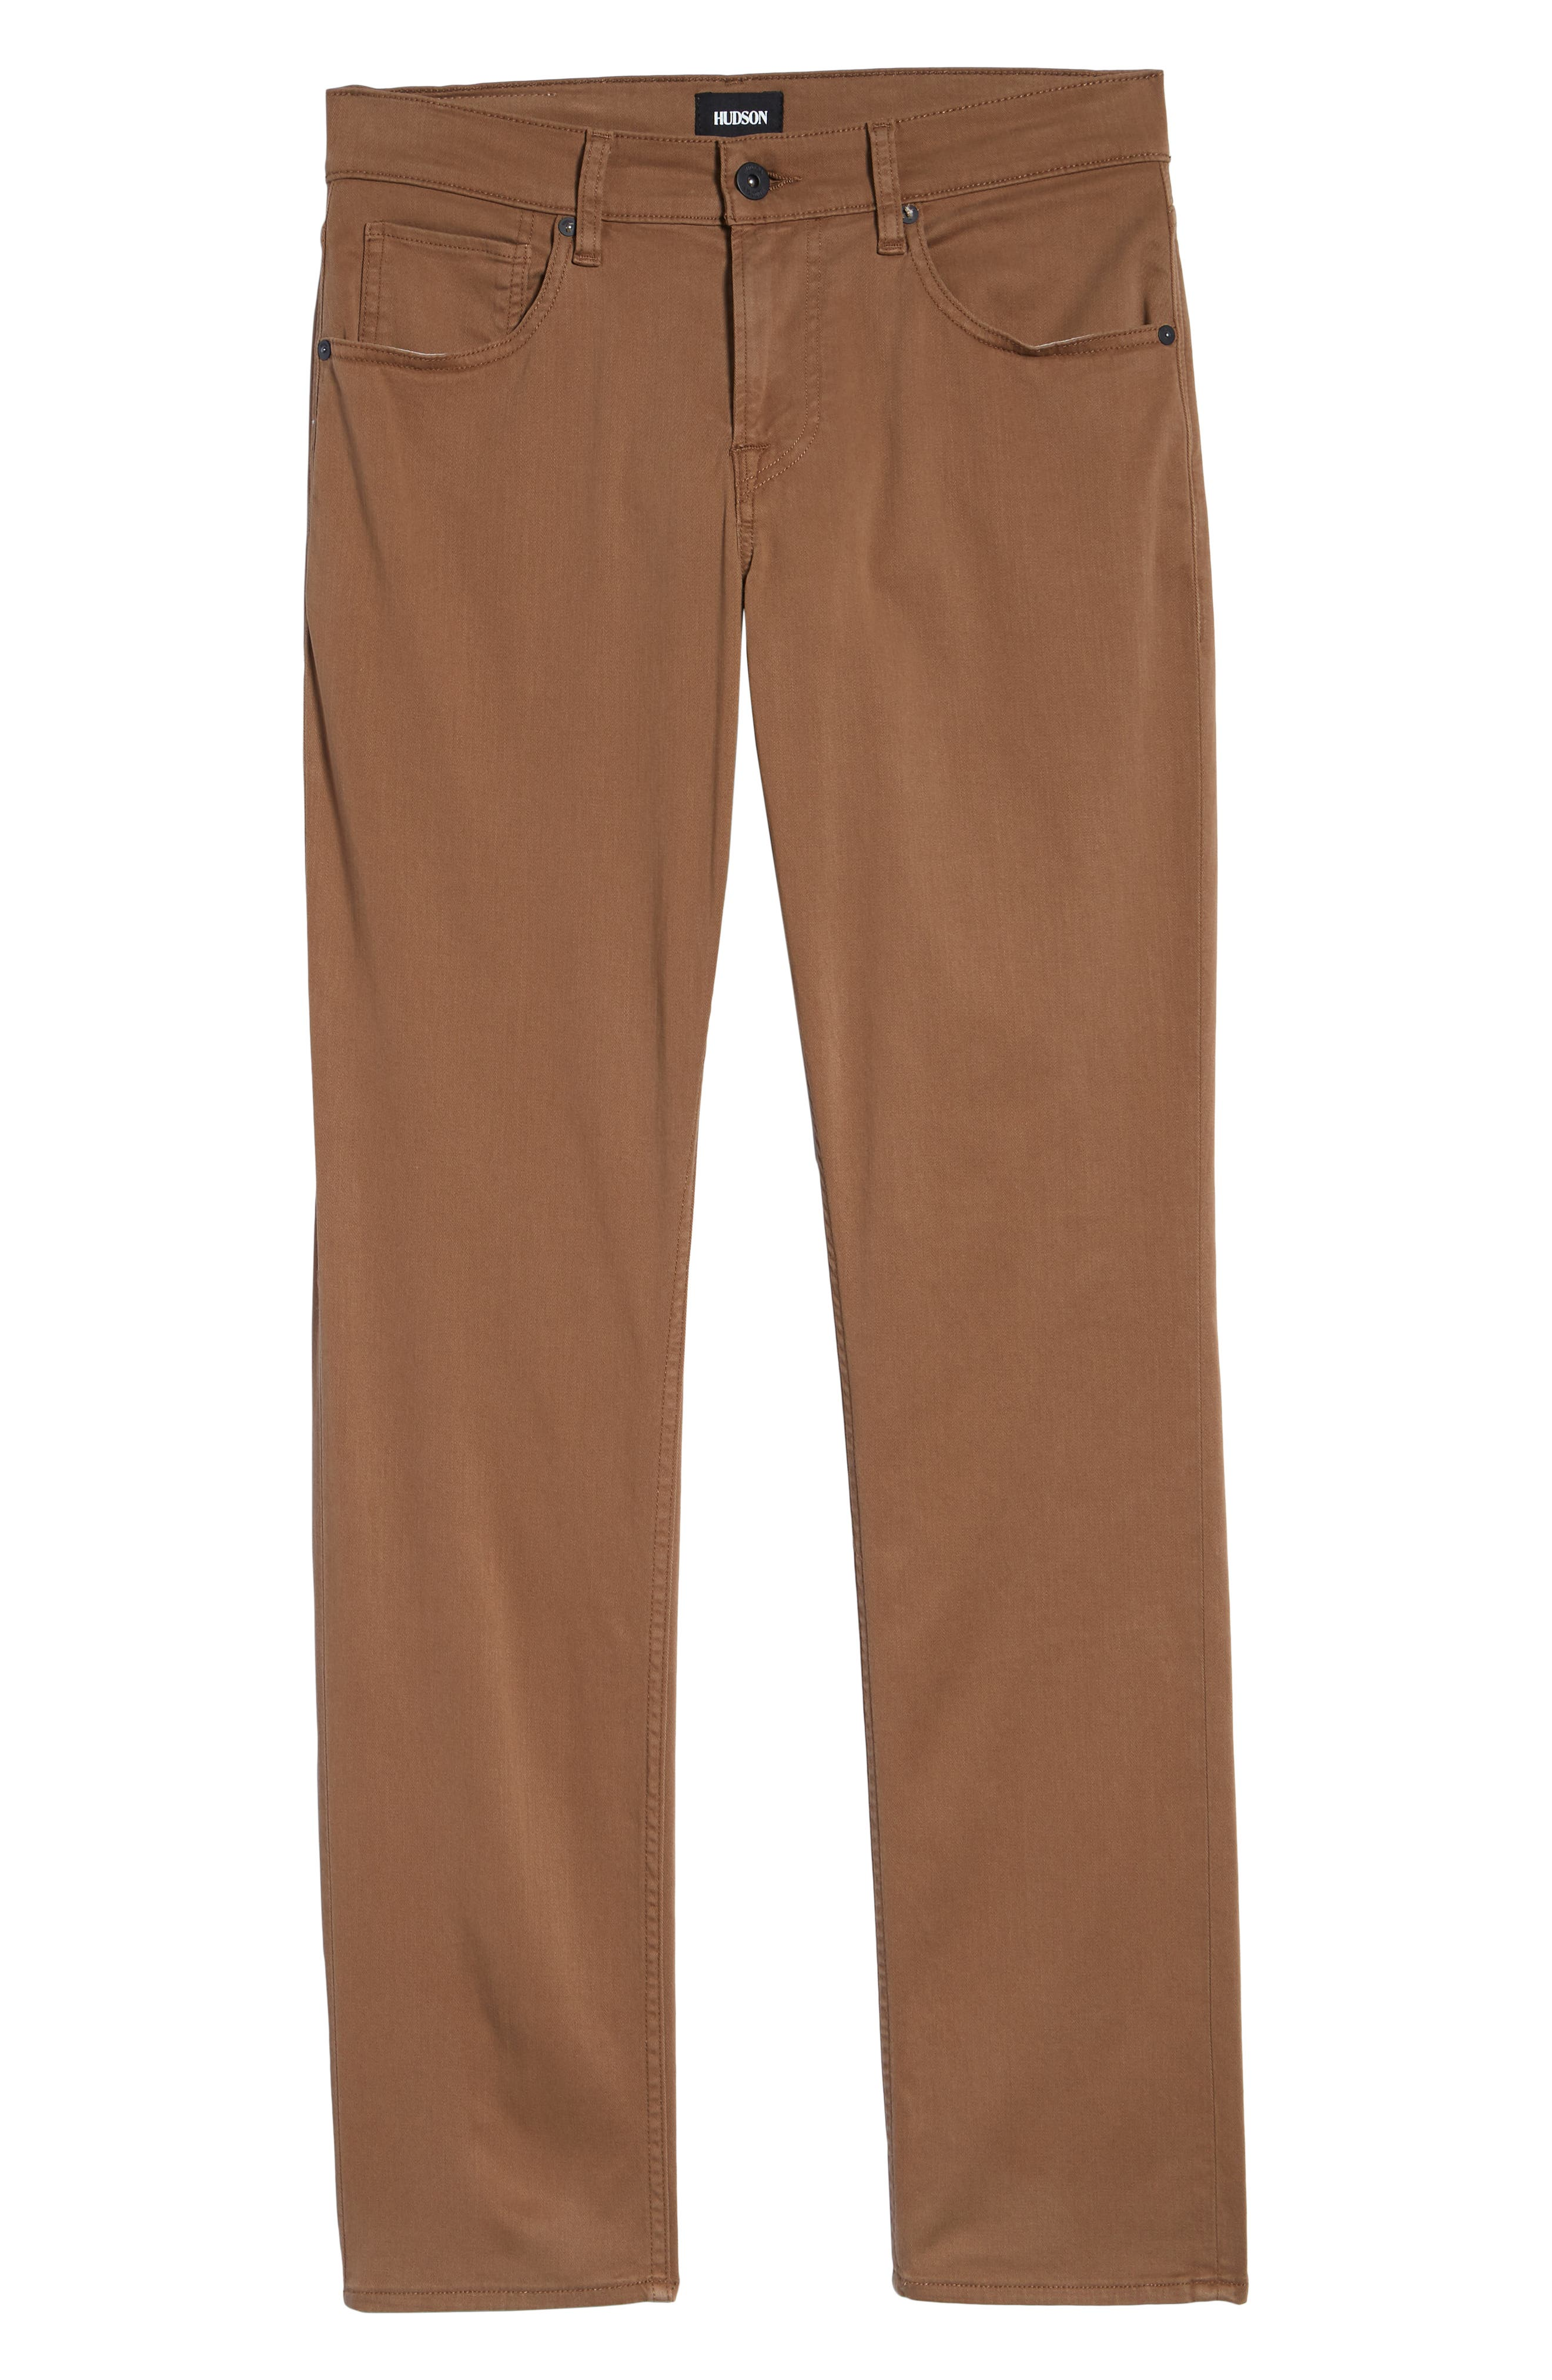 Hudson Blake Slim Fit Jeans,                             Alternate thumbnail 6, color,                             SIENNA